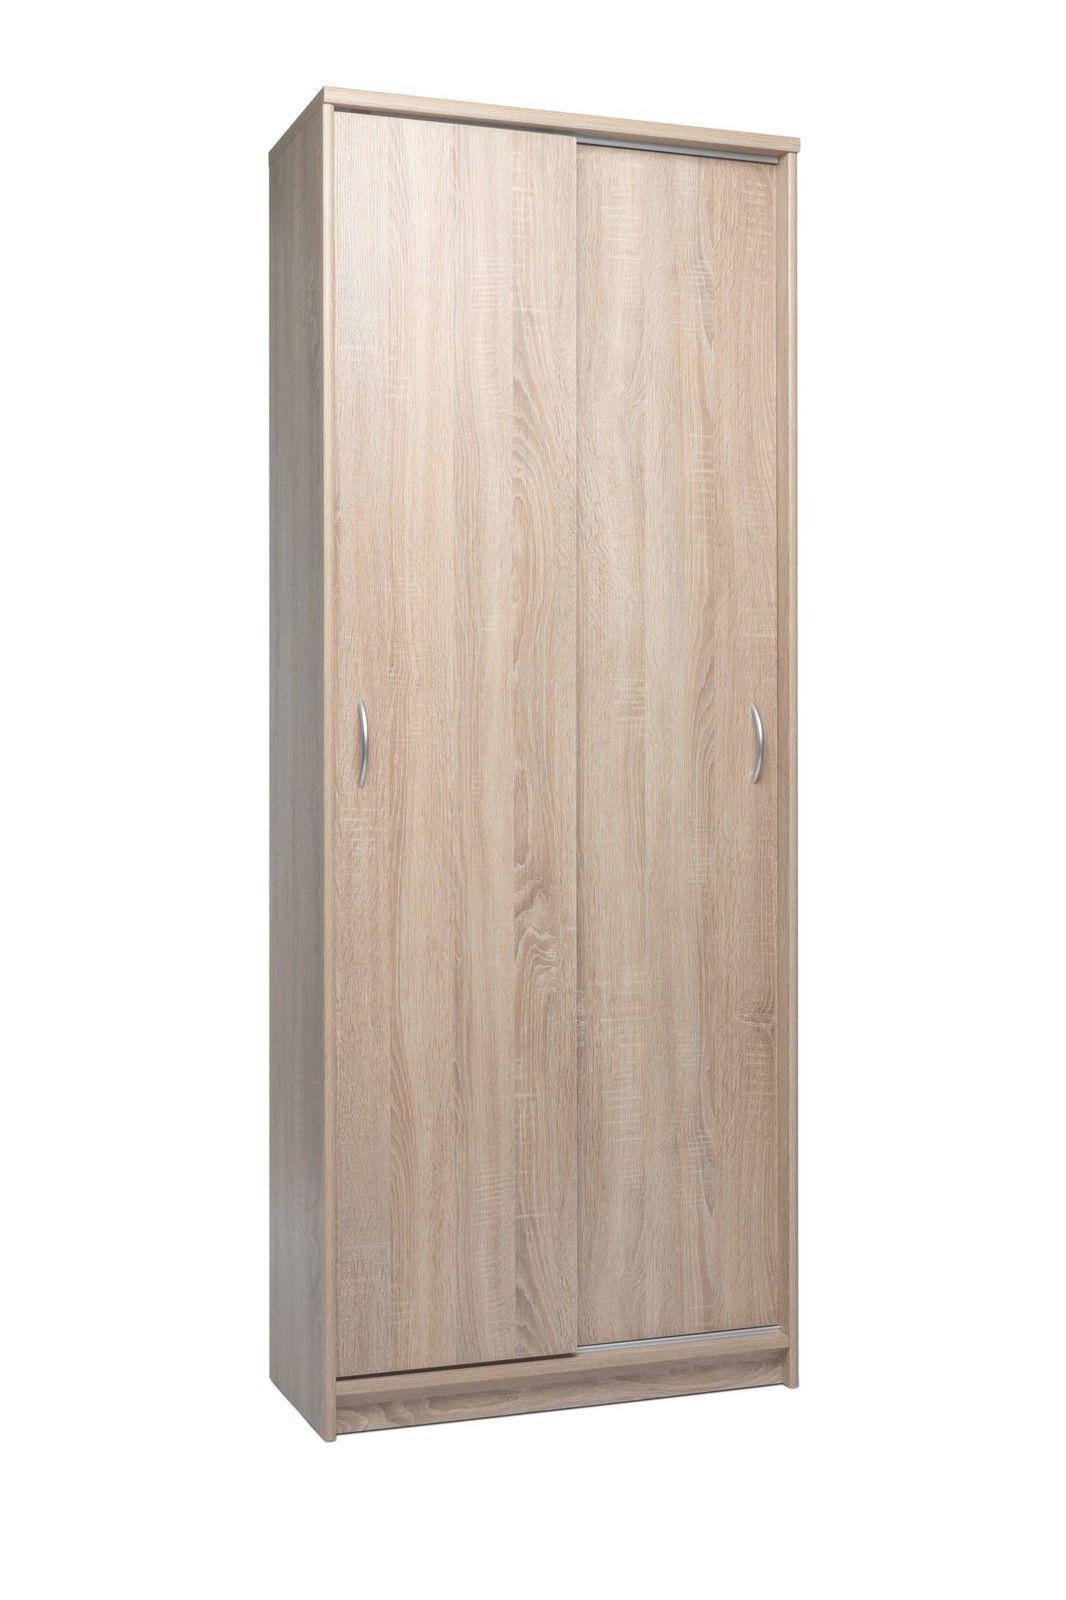 schrank schiebet renschrank bonn 14 74x188 cm dekor. Black Bedroom Furniture Sets. Home Design Ideas